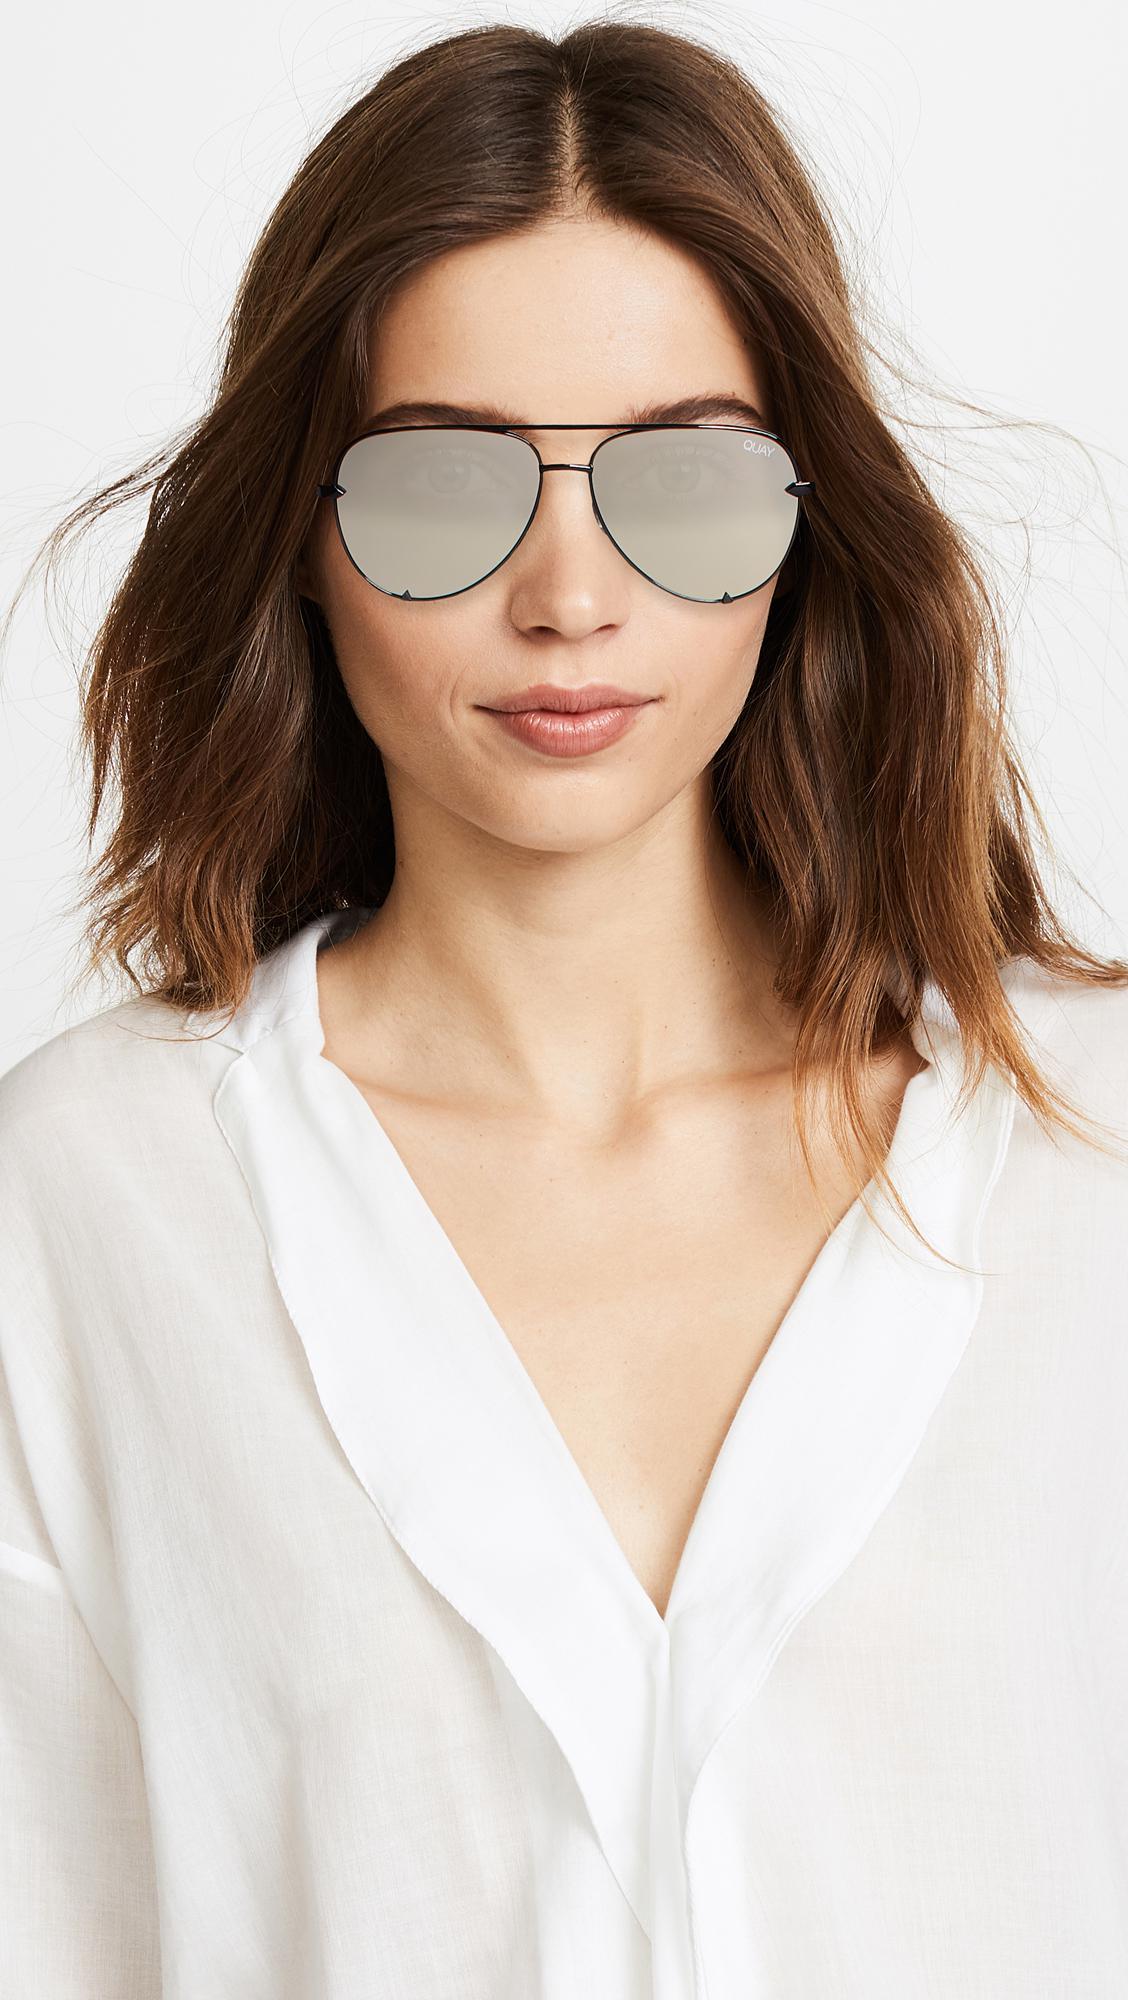 cf667d0710a Lyst - Quay X Desi Perkins High Key Mini Sunglasses